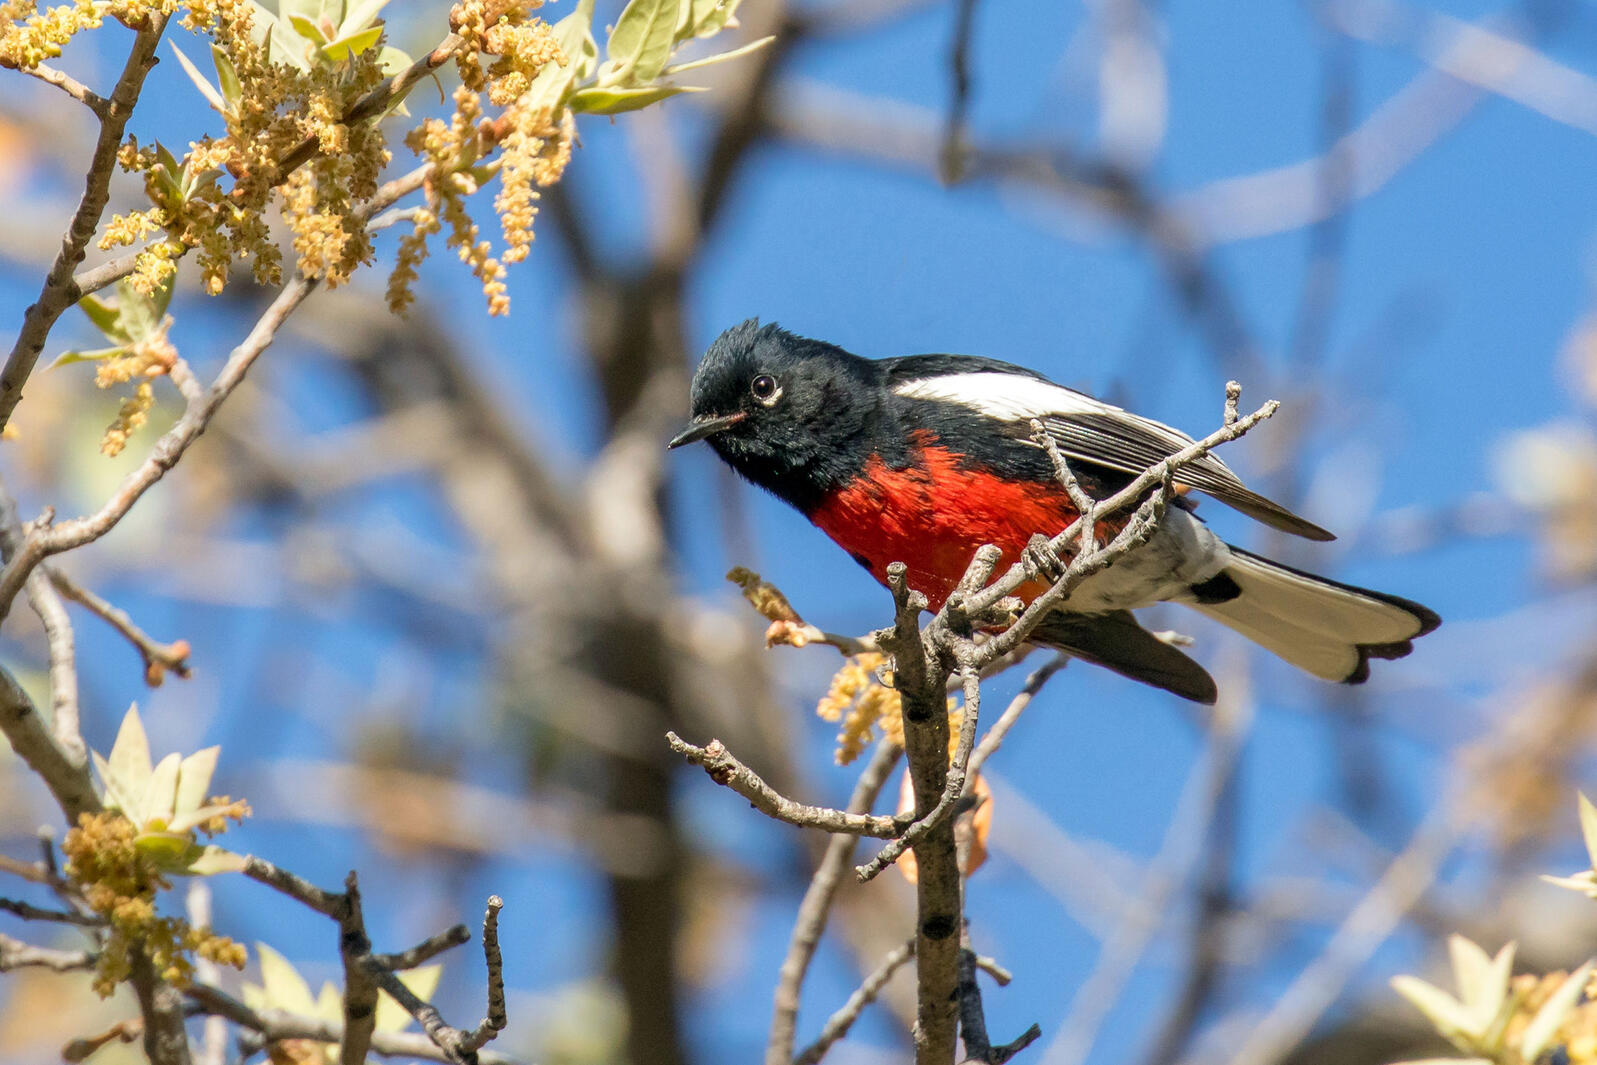 Painted Redstart. Mick Thompson/Eastside Audubon